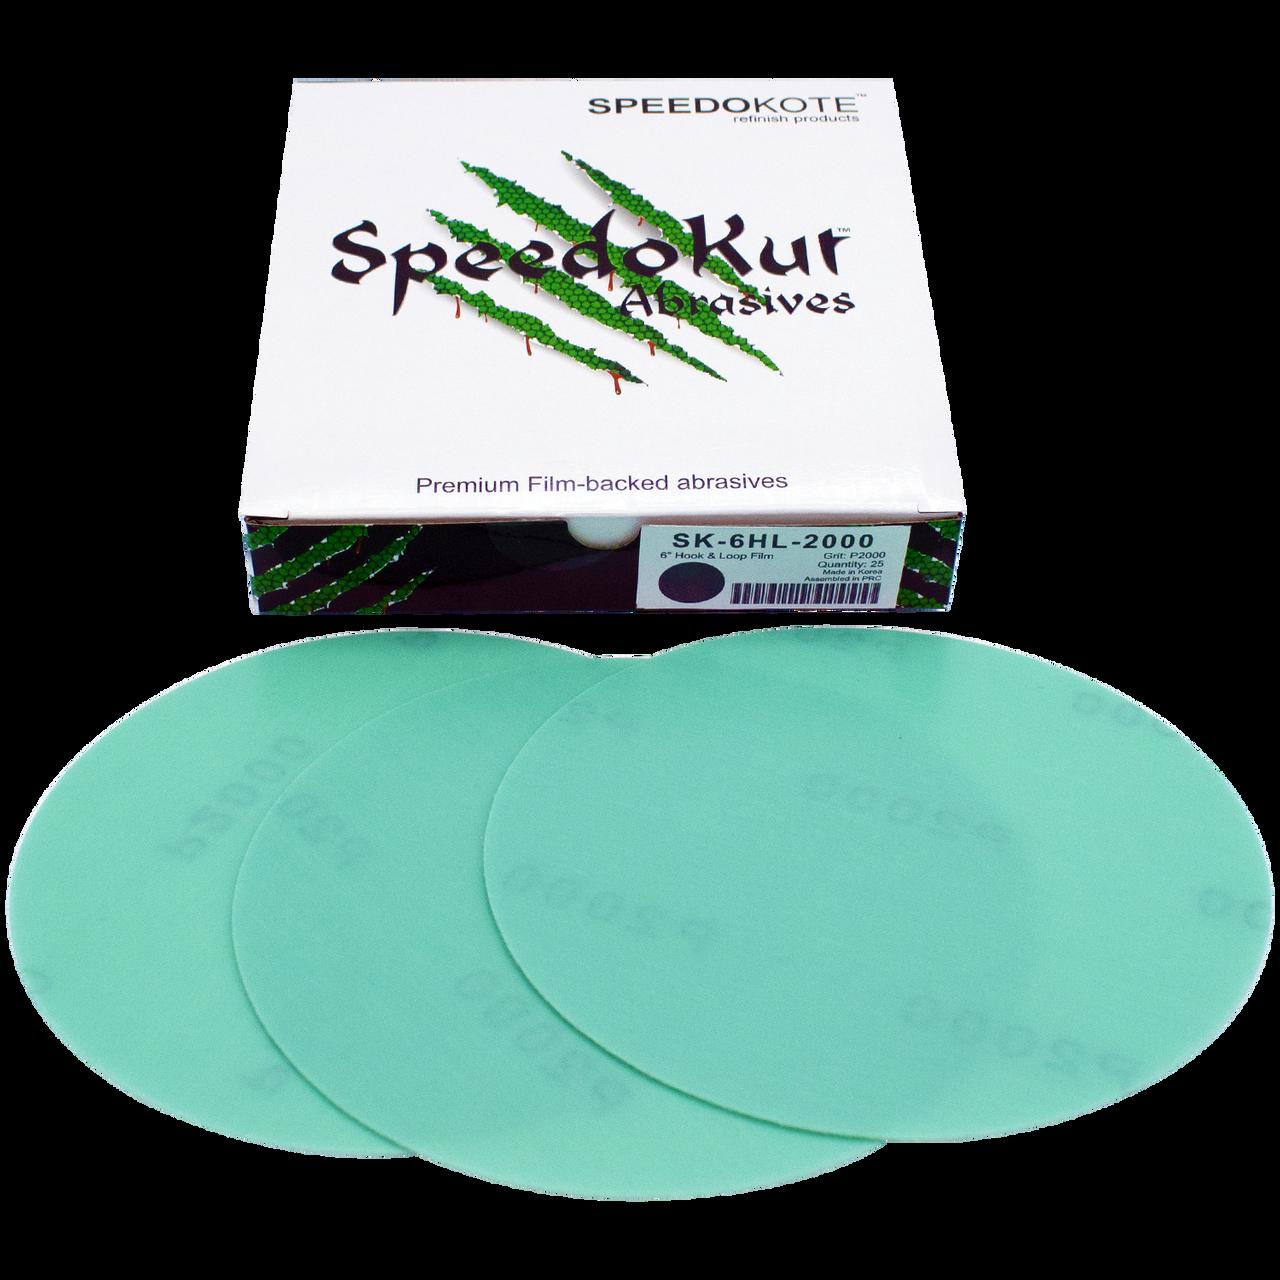 Automotive Sandpaper 2000 grit, Premium Film Backed Abrasive, 6 inch Hook & Loop Discs, 25 pack